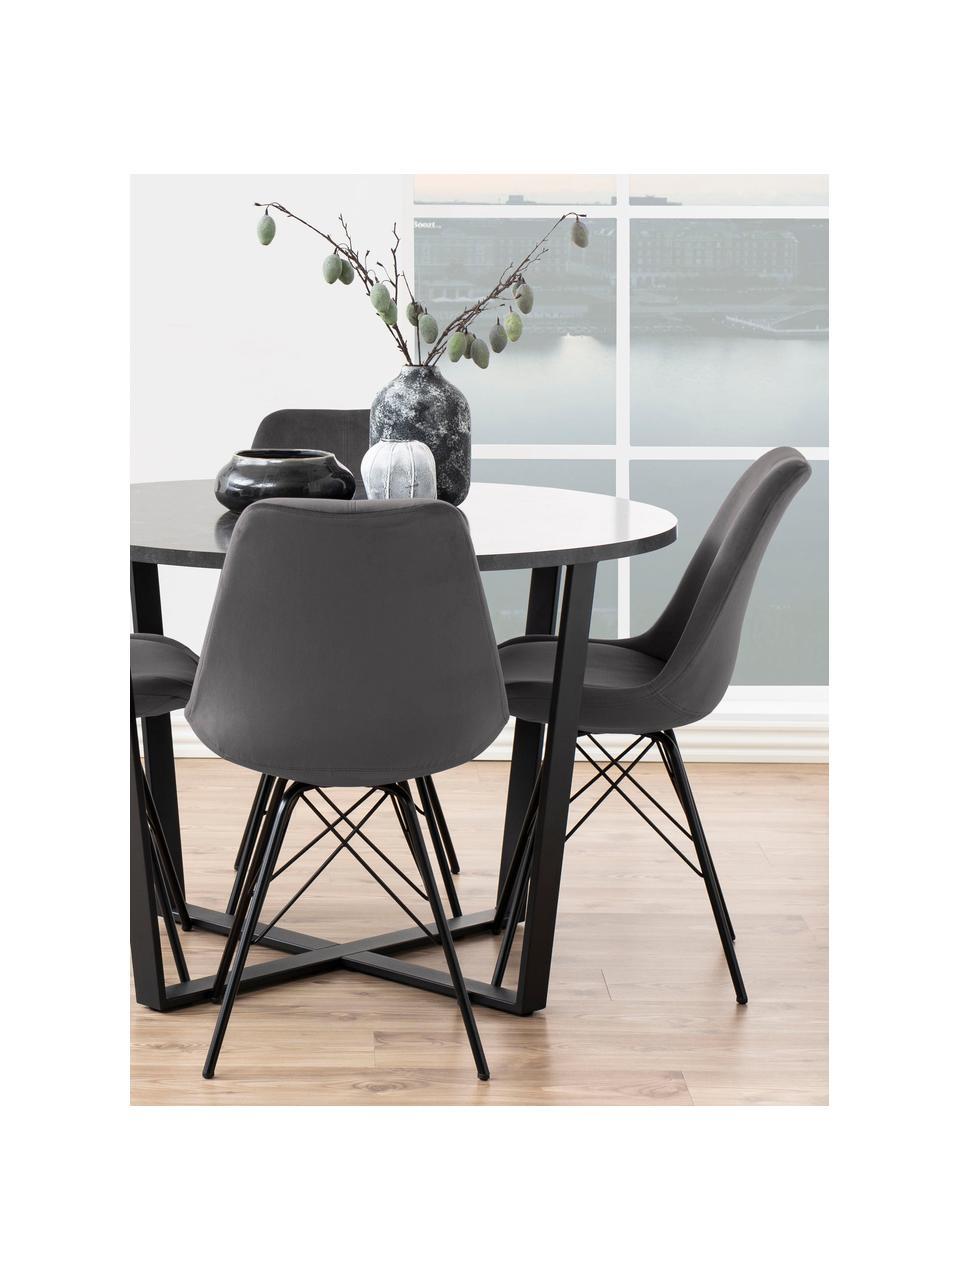 Fluwelen stoelen Eris in donkergrijs, 2 stuks, Bekleding: polyester fluweel, Poten: gepoedercoat metaal, Fluweel donkergrijs, poten zwart, B 49 x D 54 cm